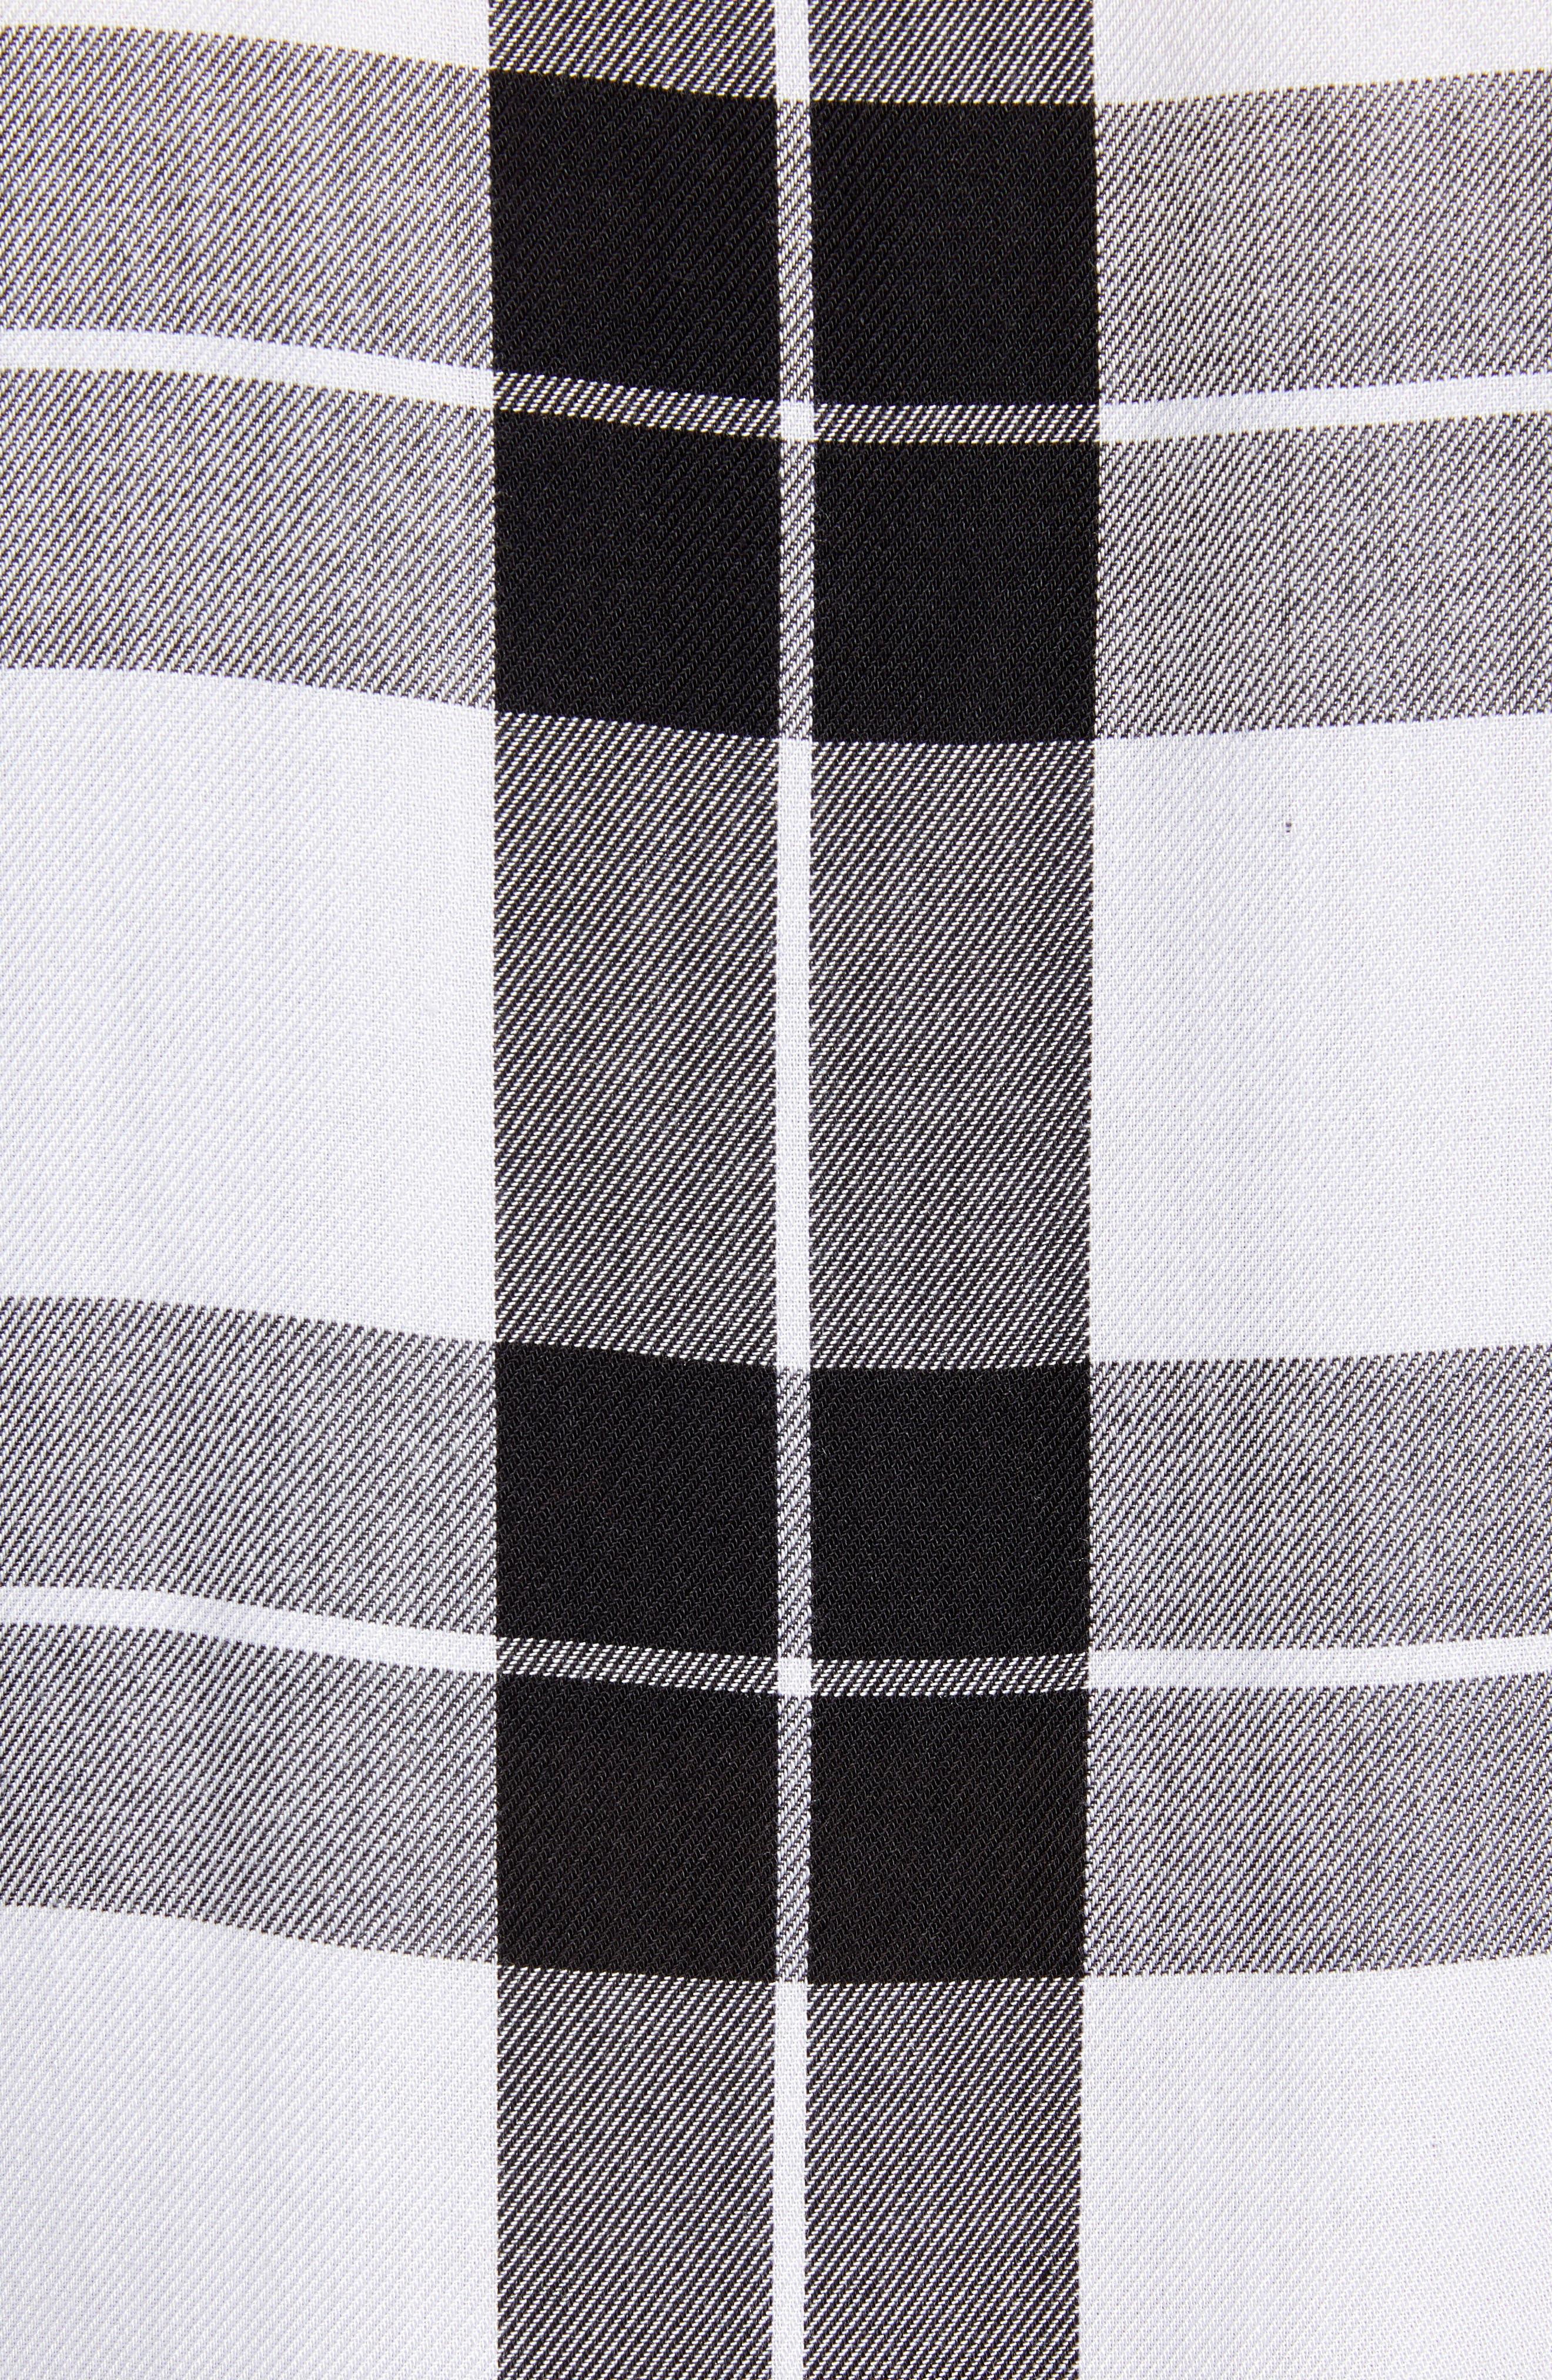 Classic Plaid Shirt,                             Alternate thumbnail 5, color,                             001